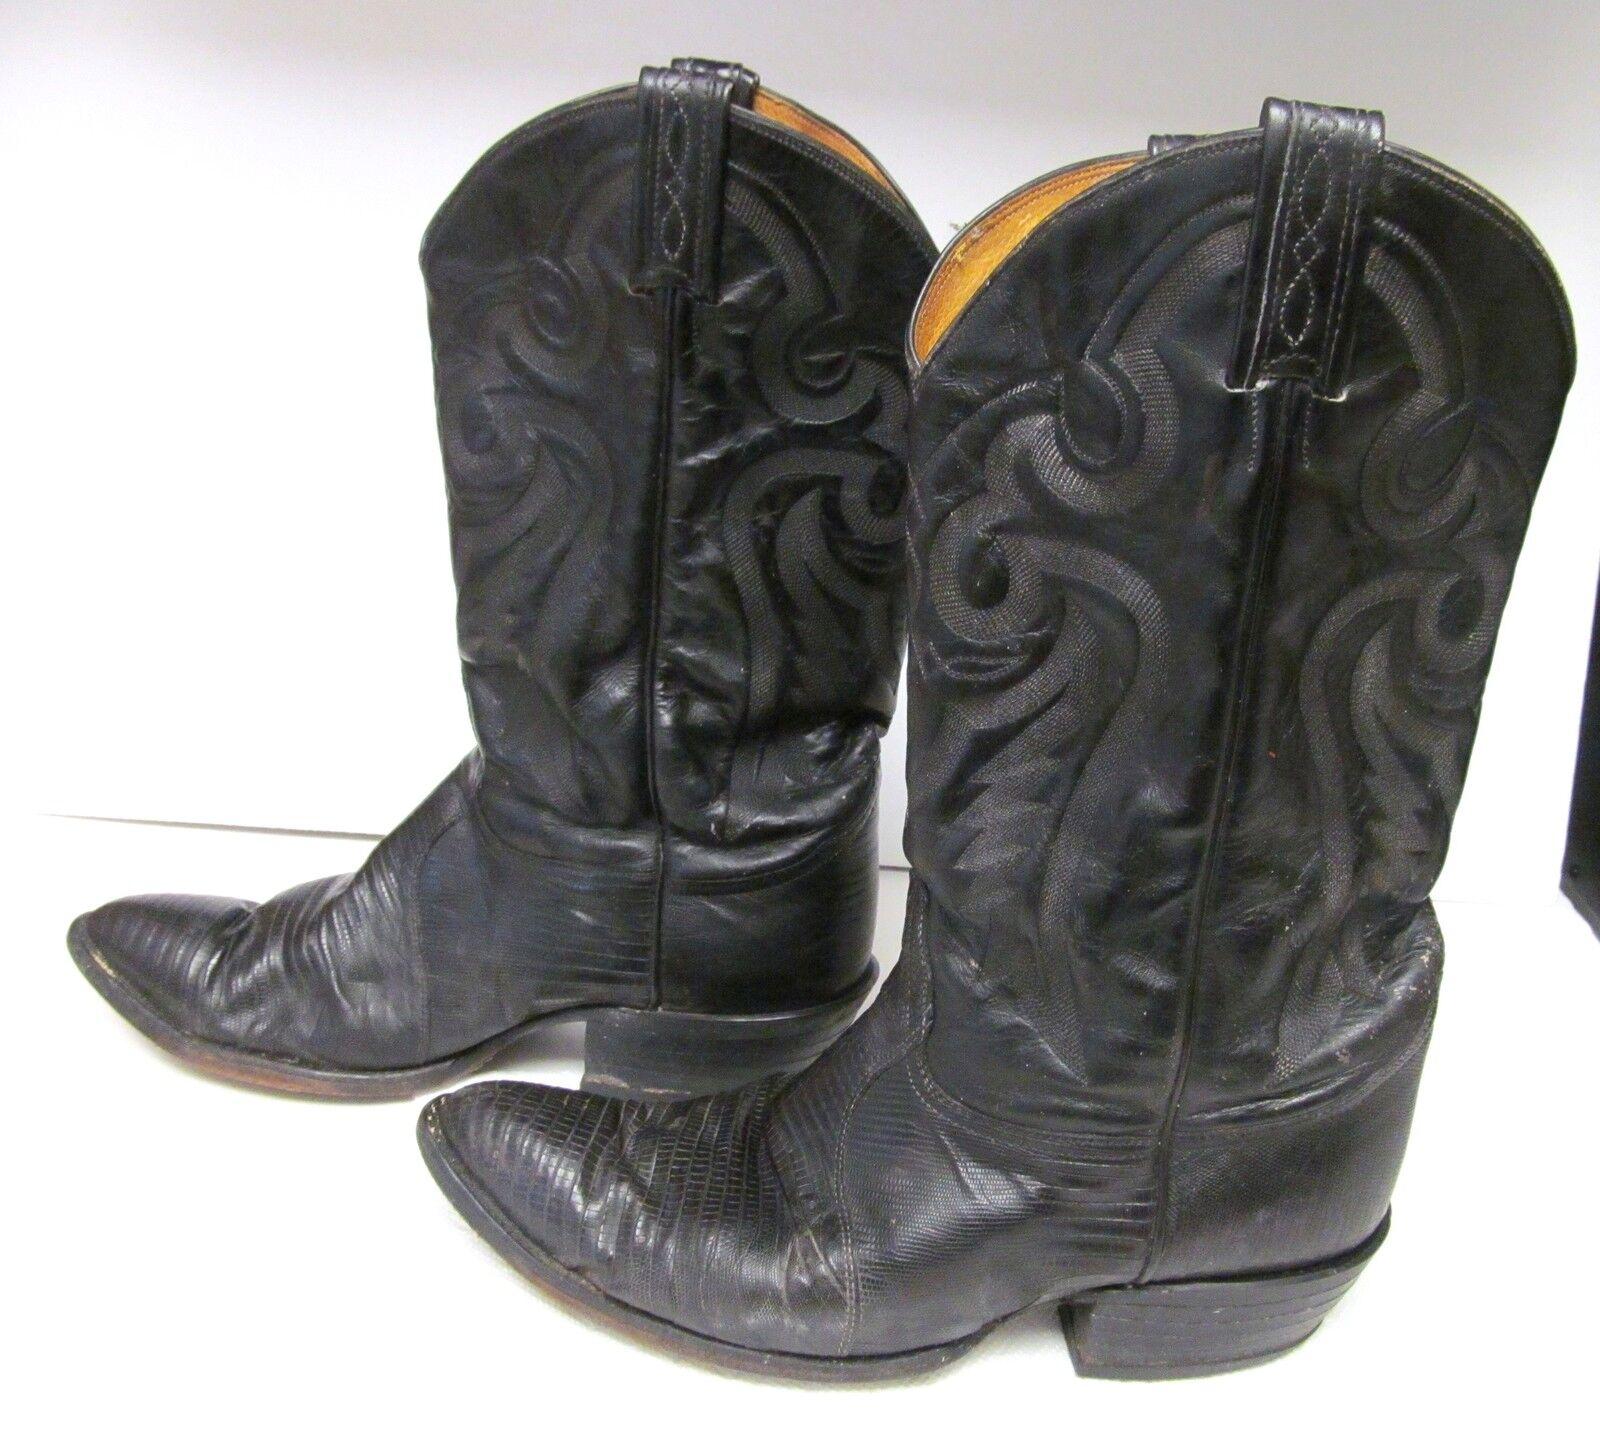 TONY LAMA BLACK LIZARD LEATHER BOOTS STYLE 8575 Distressed Vintage 10 D